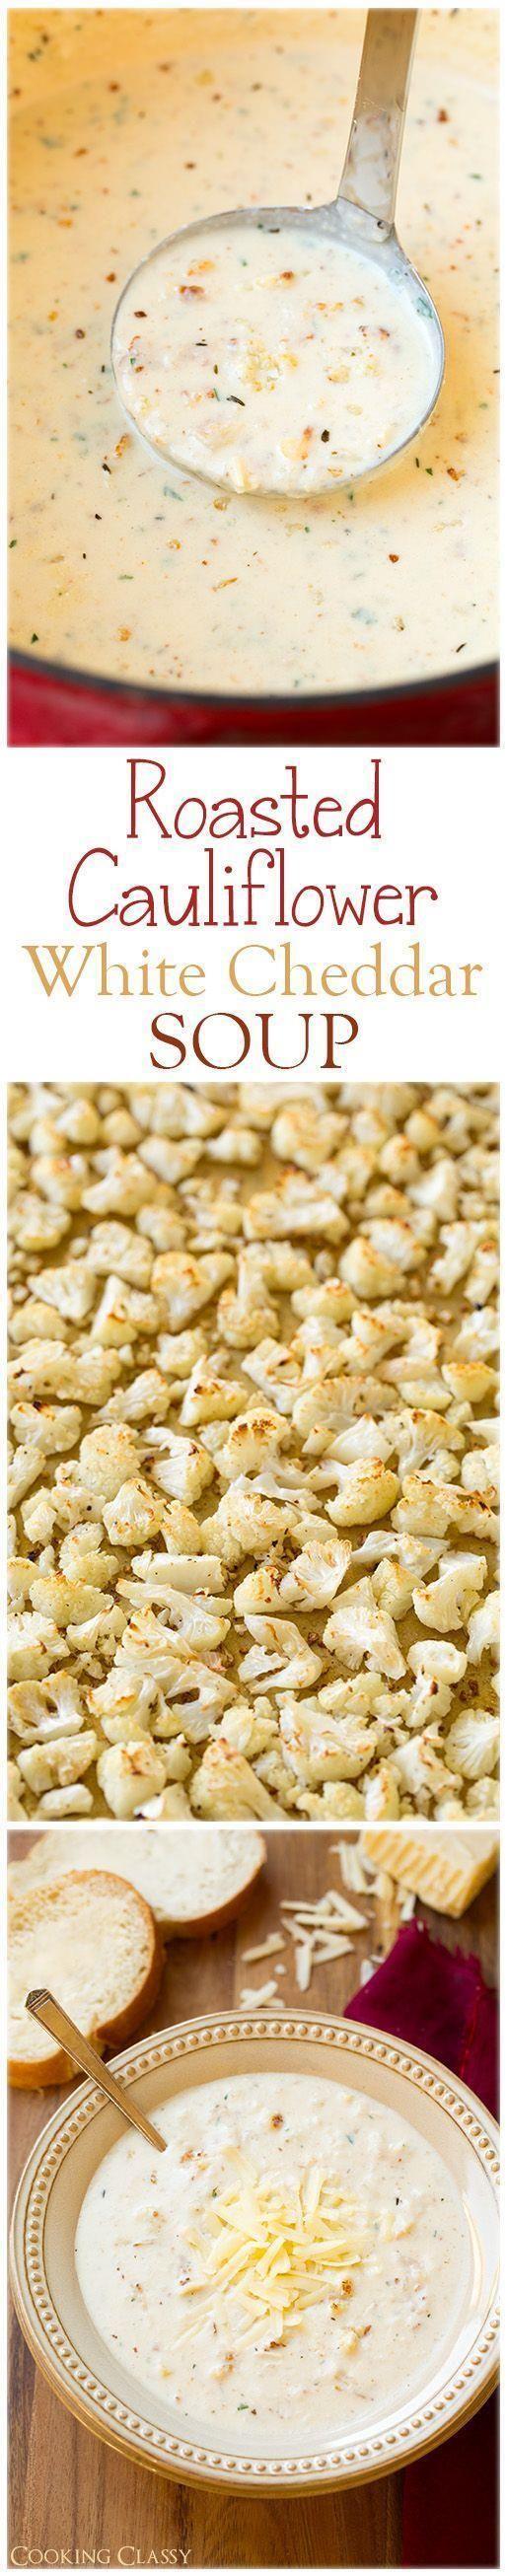 Roasted Cauliflower White Cheddar Soup